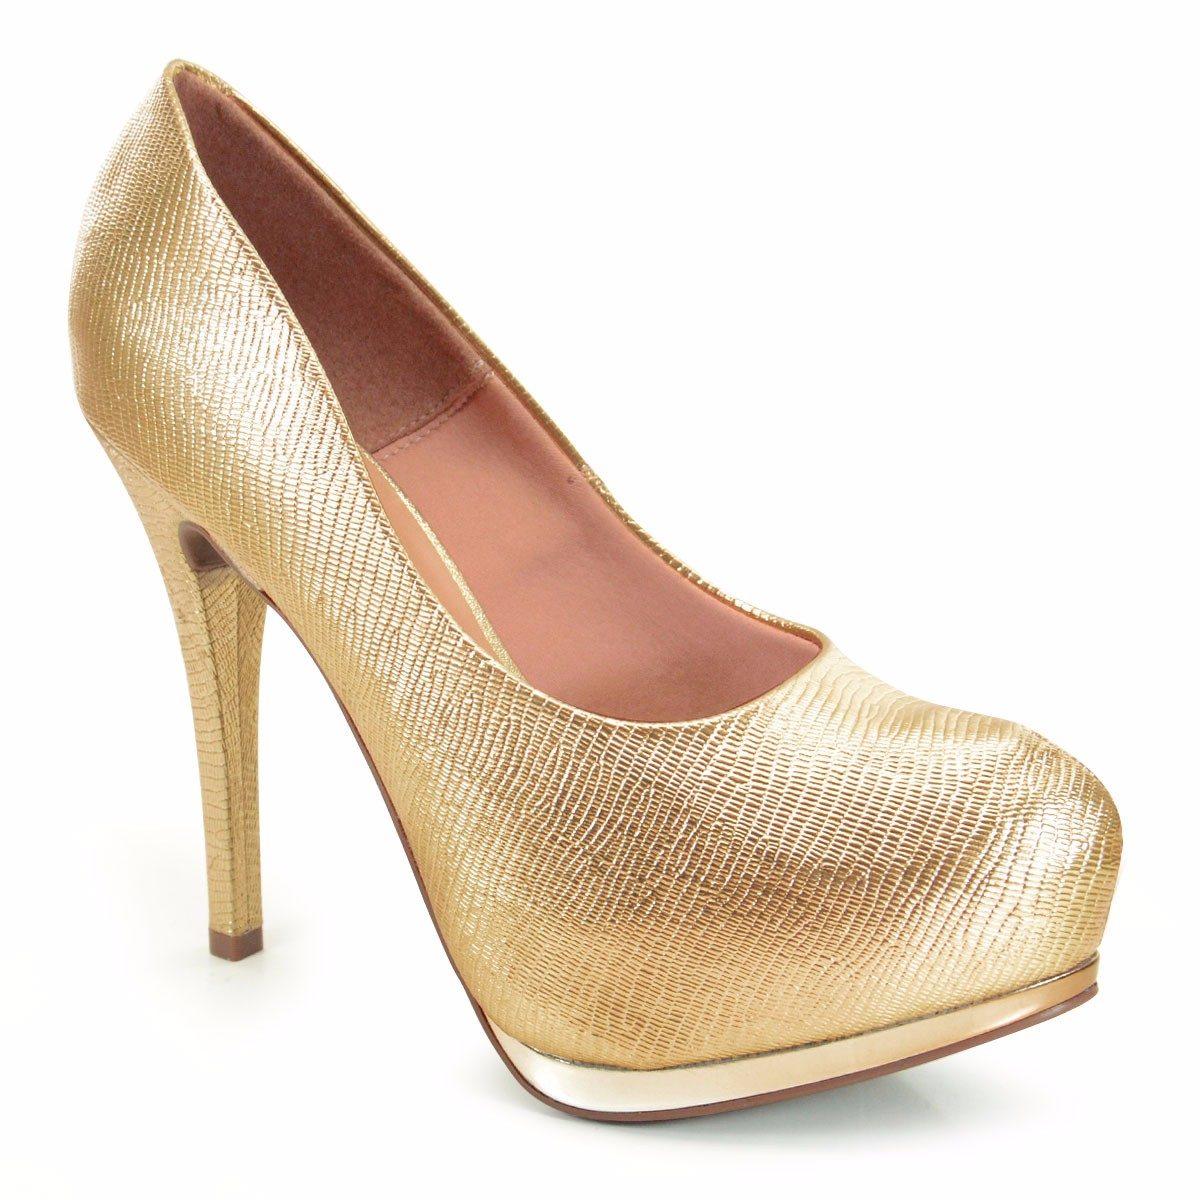 b0d692c2a Sapato Vizzano Meia Pata Mini Lezard Metalizado Ouro - Compre Agora ...